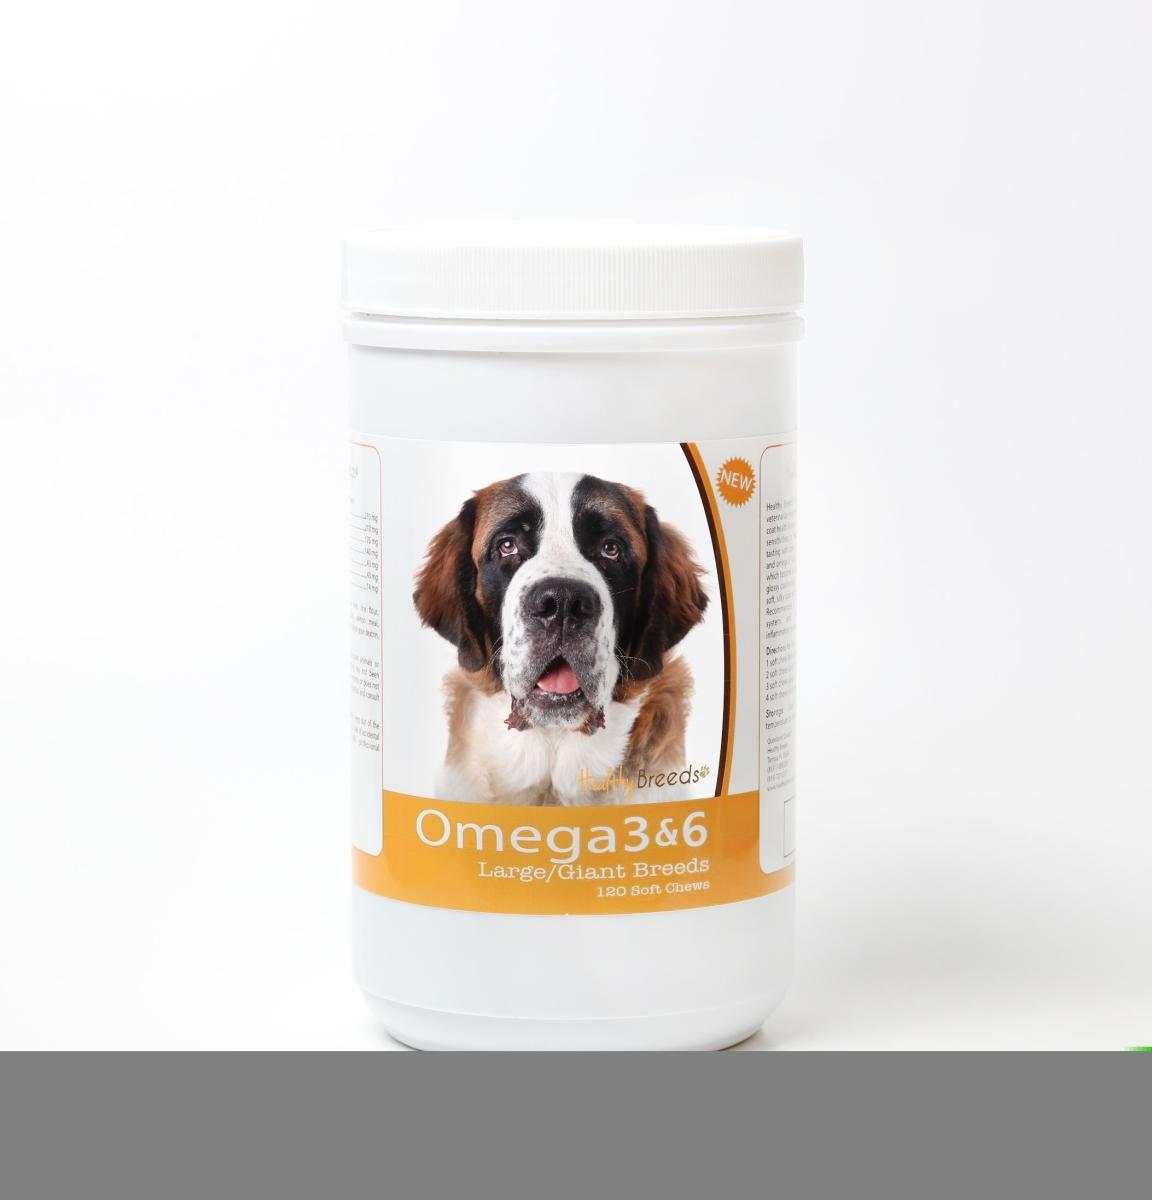 Healthy Breeds 840235143512 Saint Bernard Omega 3 & 6 Soft Chews - 120 Count